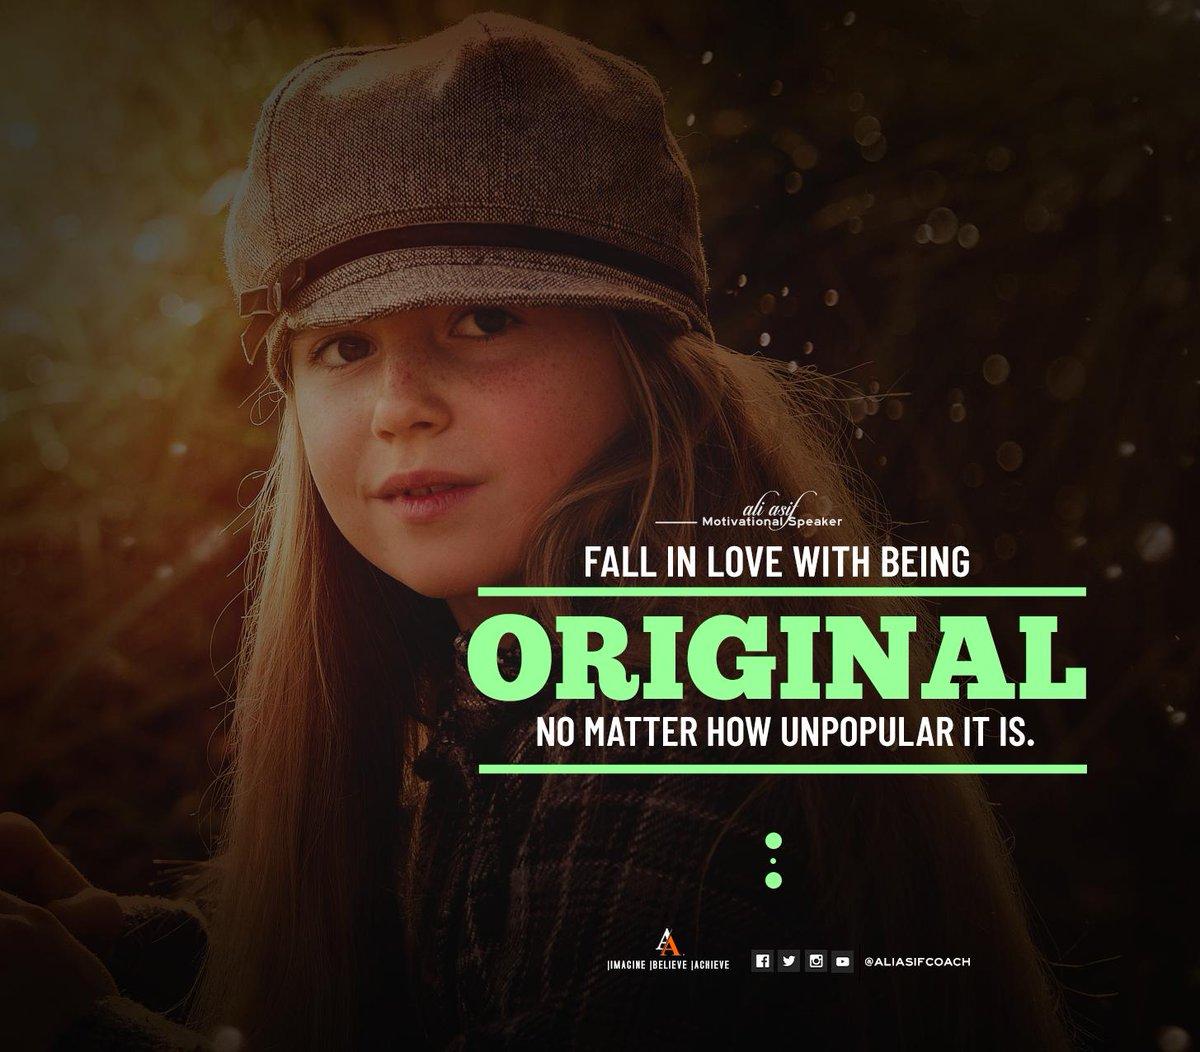 Fall in love with being original not matter how unpopular it is. #ThursdayThoughts #thursdaymorning #ThursdayMotivation #ThursdayTREATS